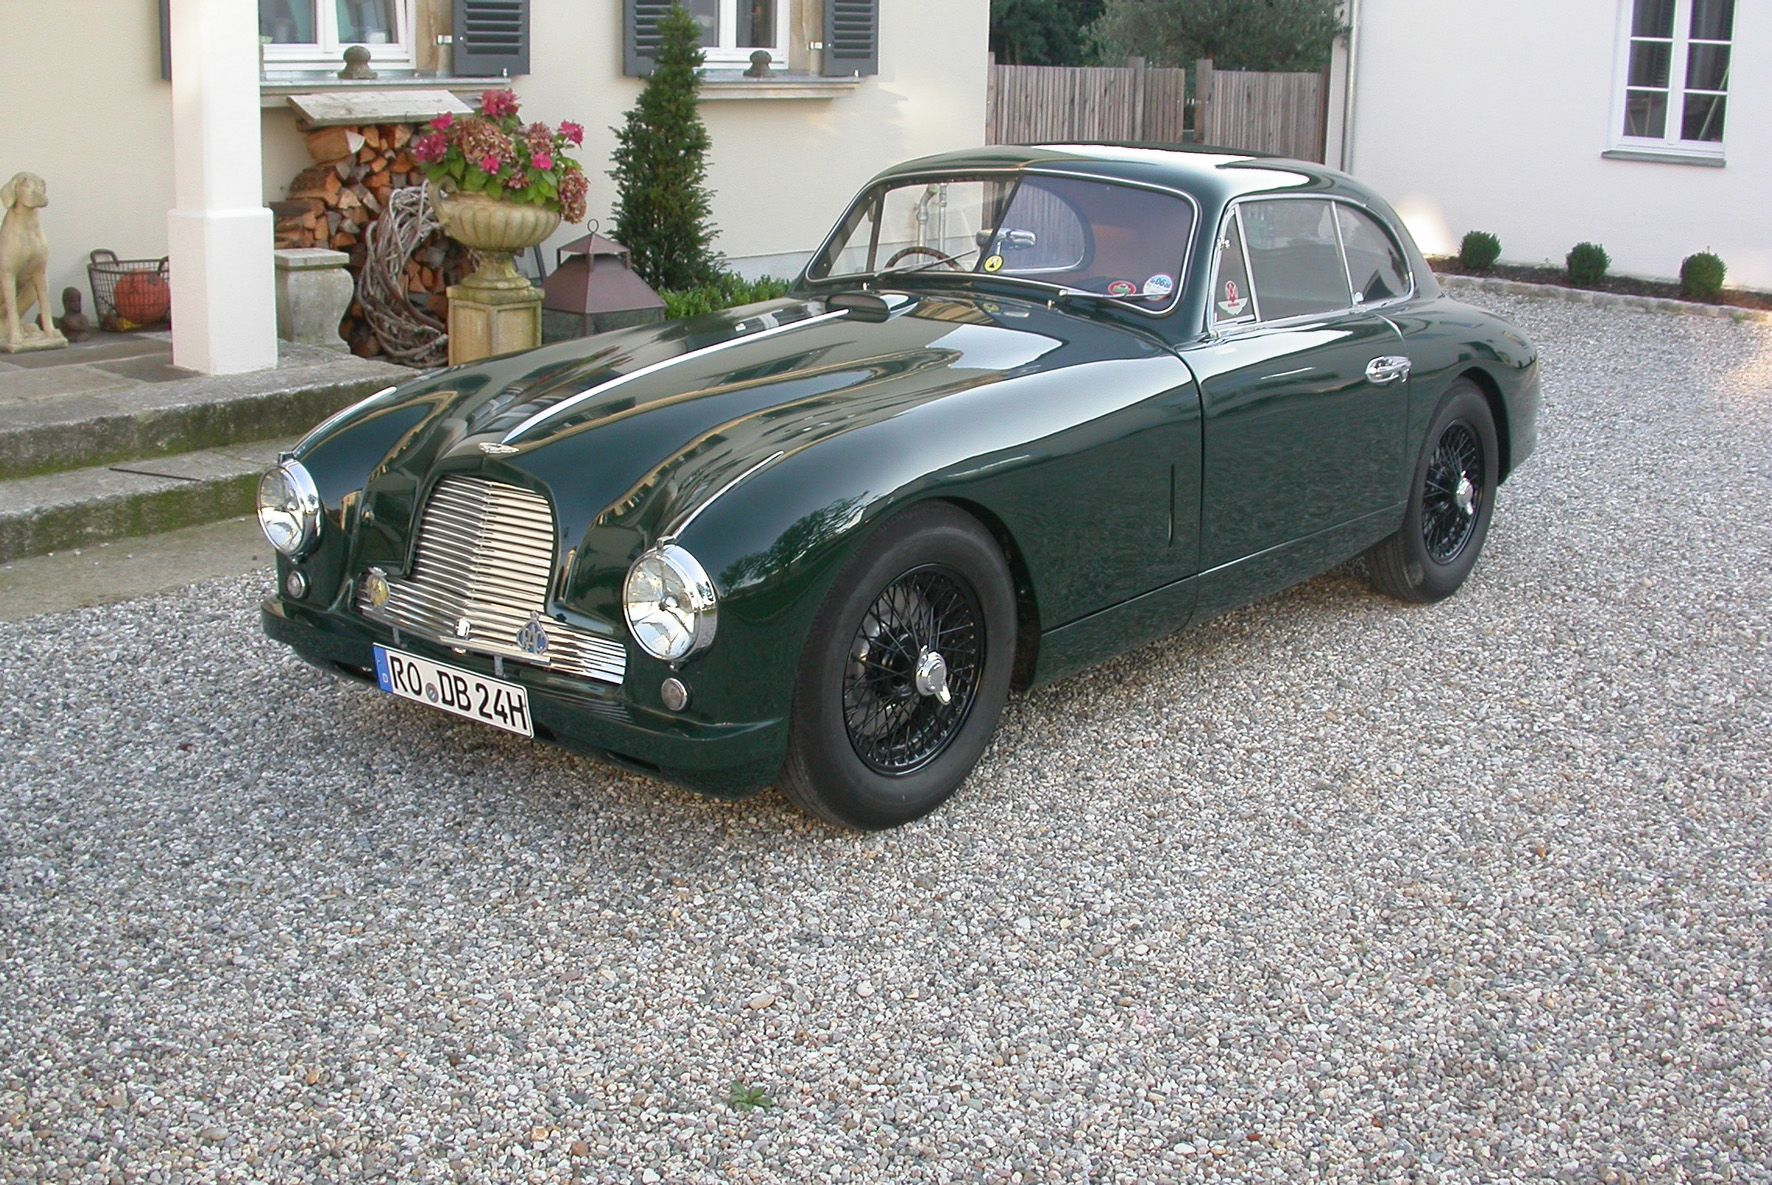 vintage aston martin - Google Search   Sports Car Fun   Pinterest ...